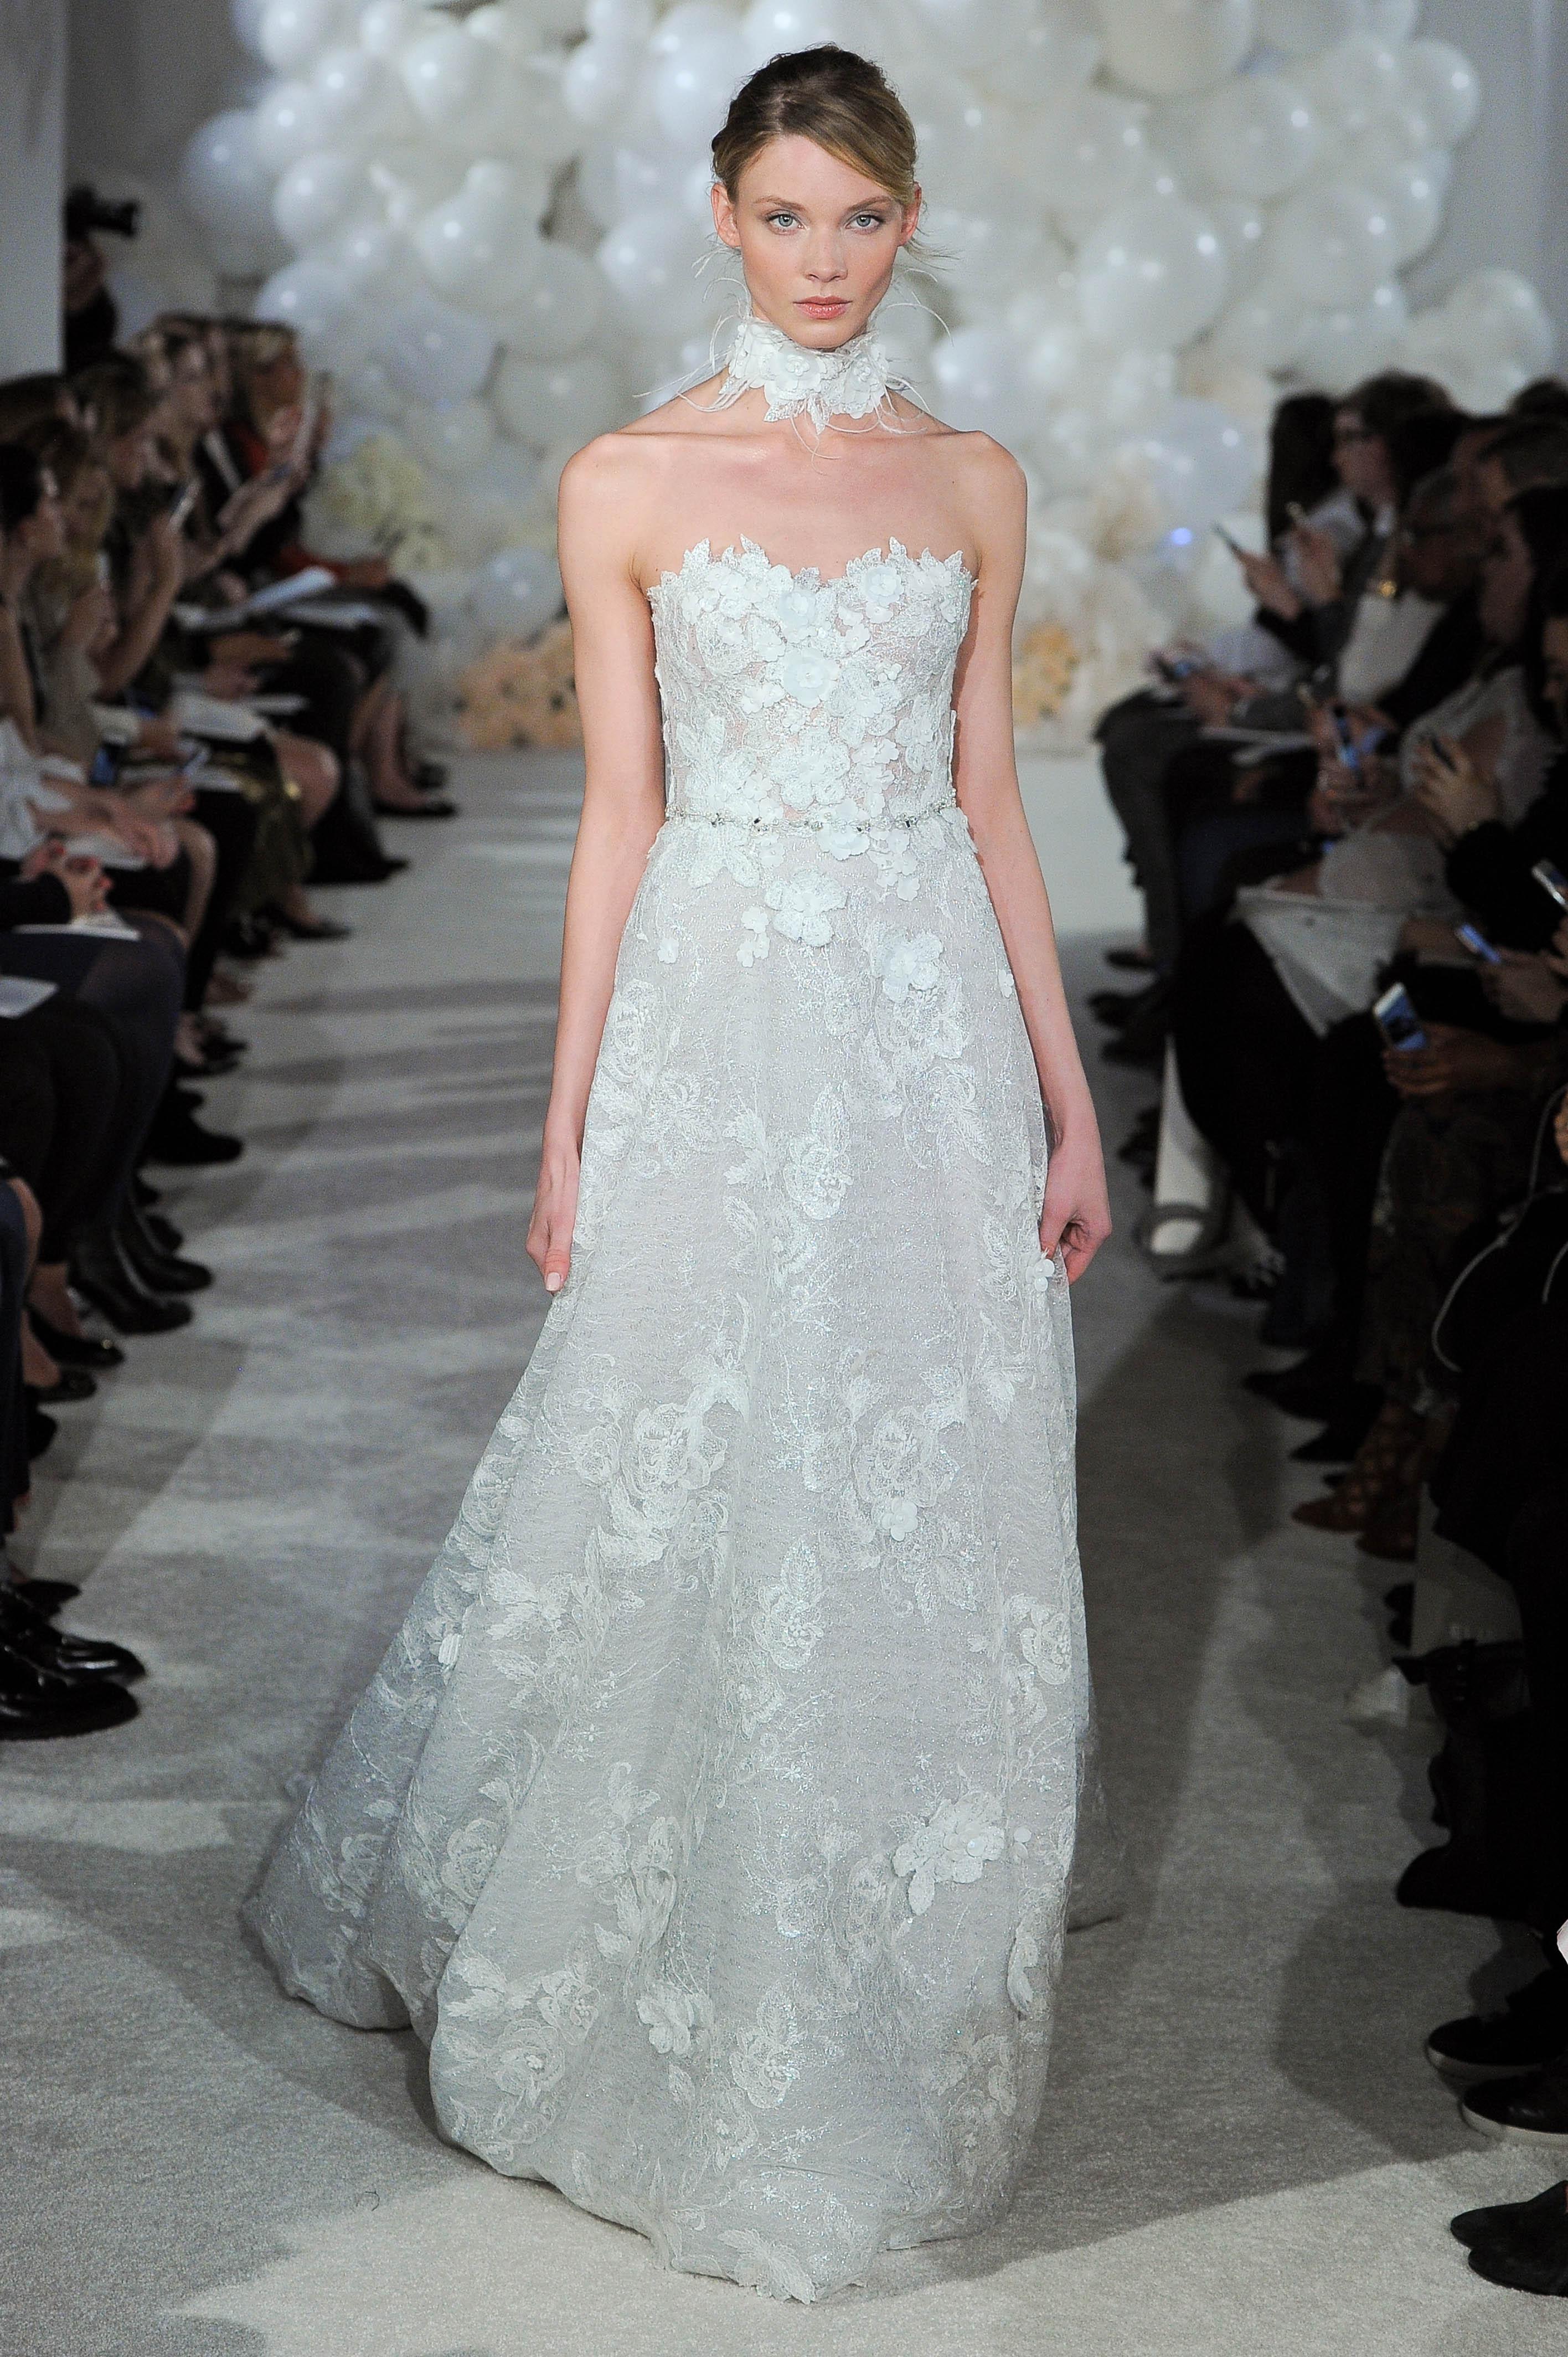 mira zwillinger wedding dress spring 2018 strapless a-line